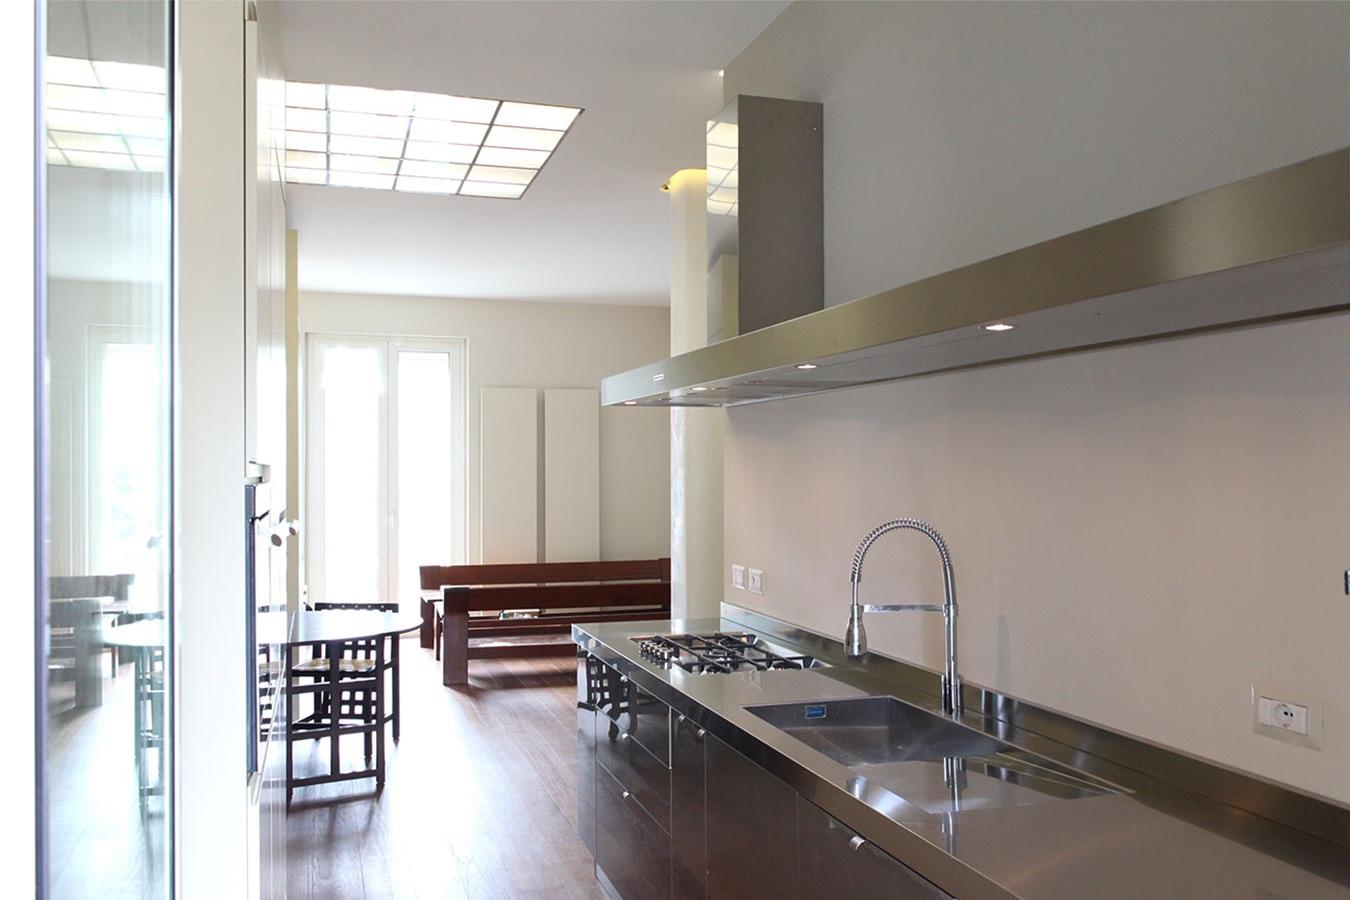 emma scolari new classic flat